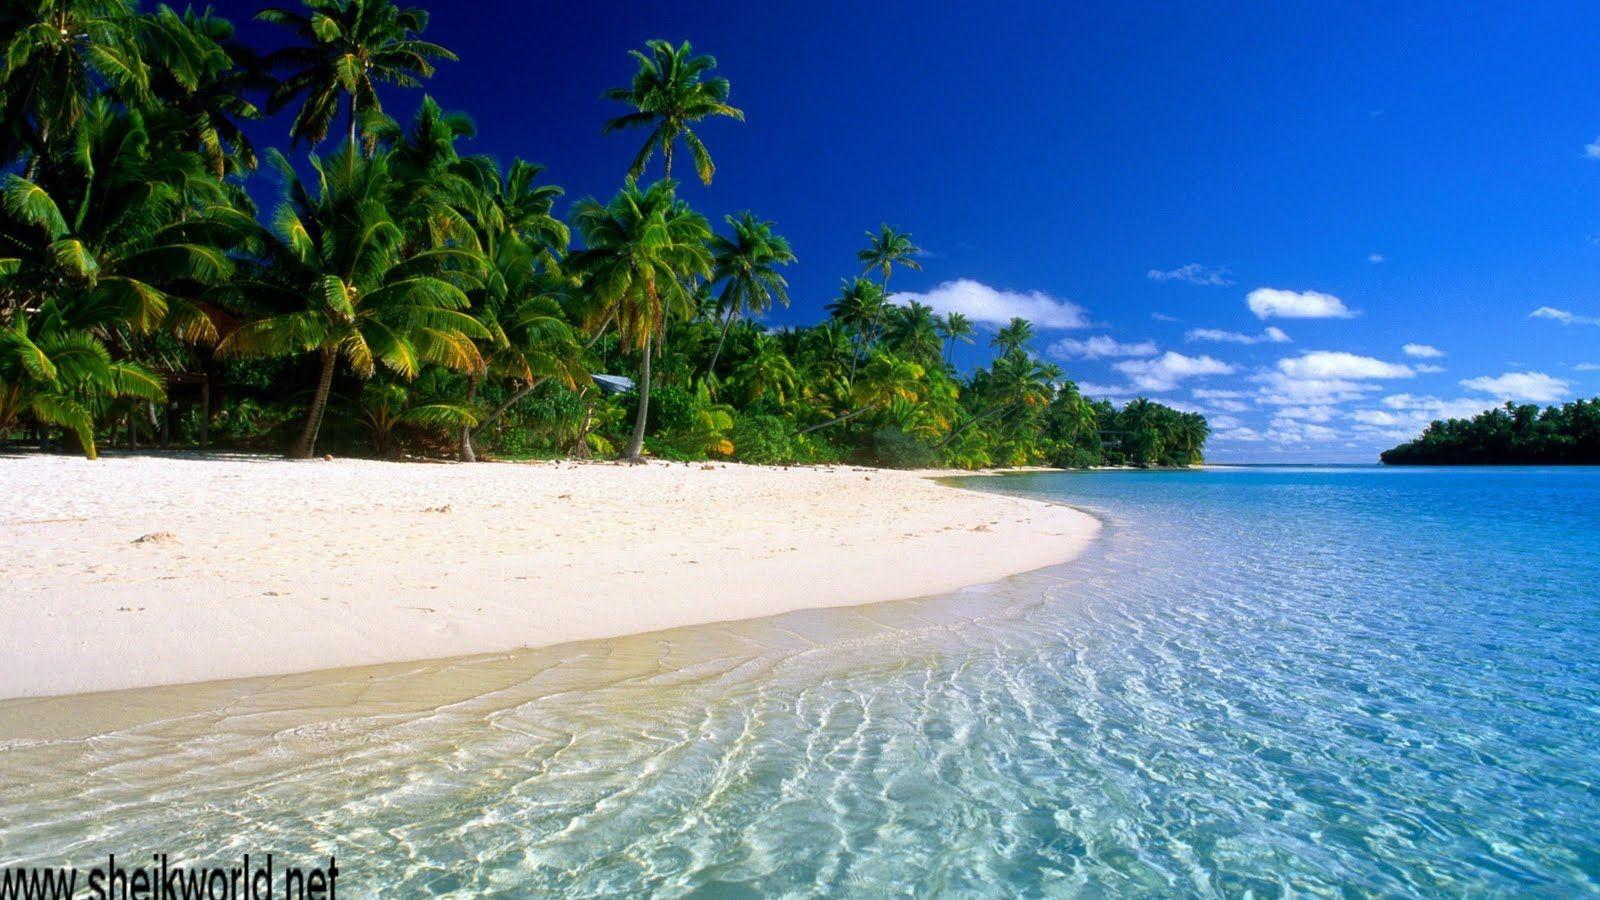 Gallery For Bahamas Wallpaper Eleuthera Beach Wallpaper Nature Beach Beautiful Beaches